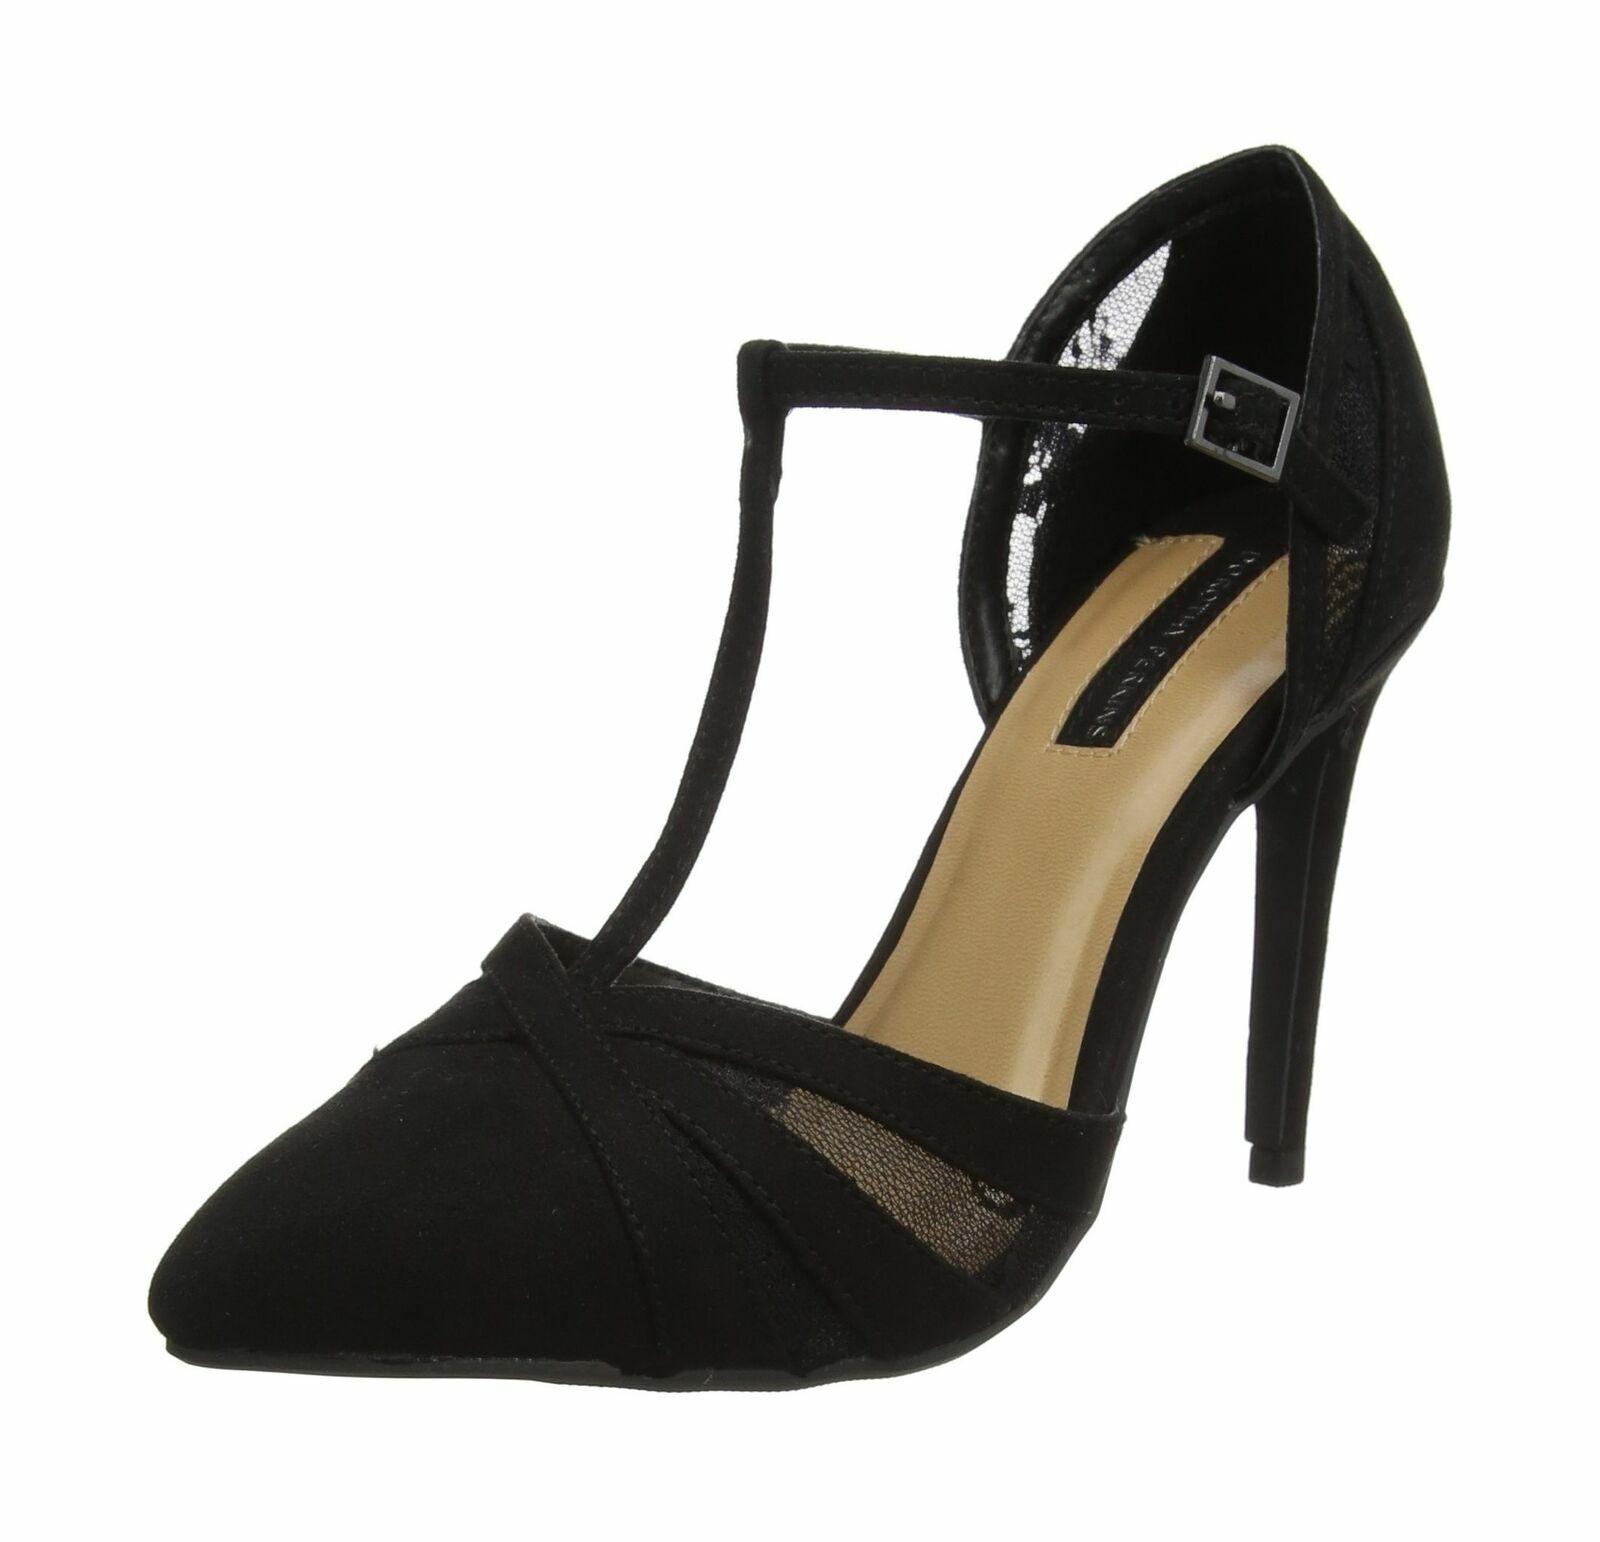 Dgoldthy Perkins Women's Gazed Closed Toe Heels Black (Black) UK 6 EU 39